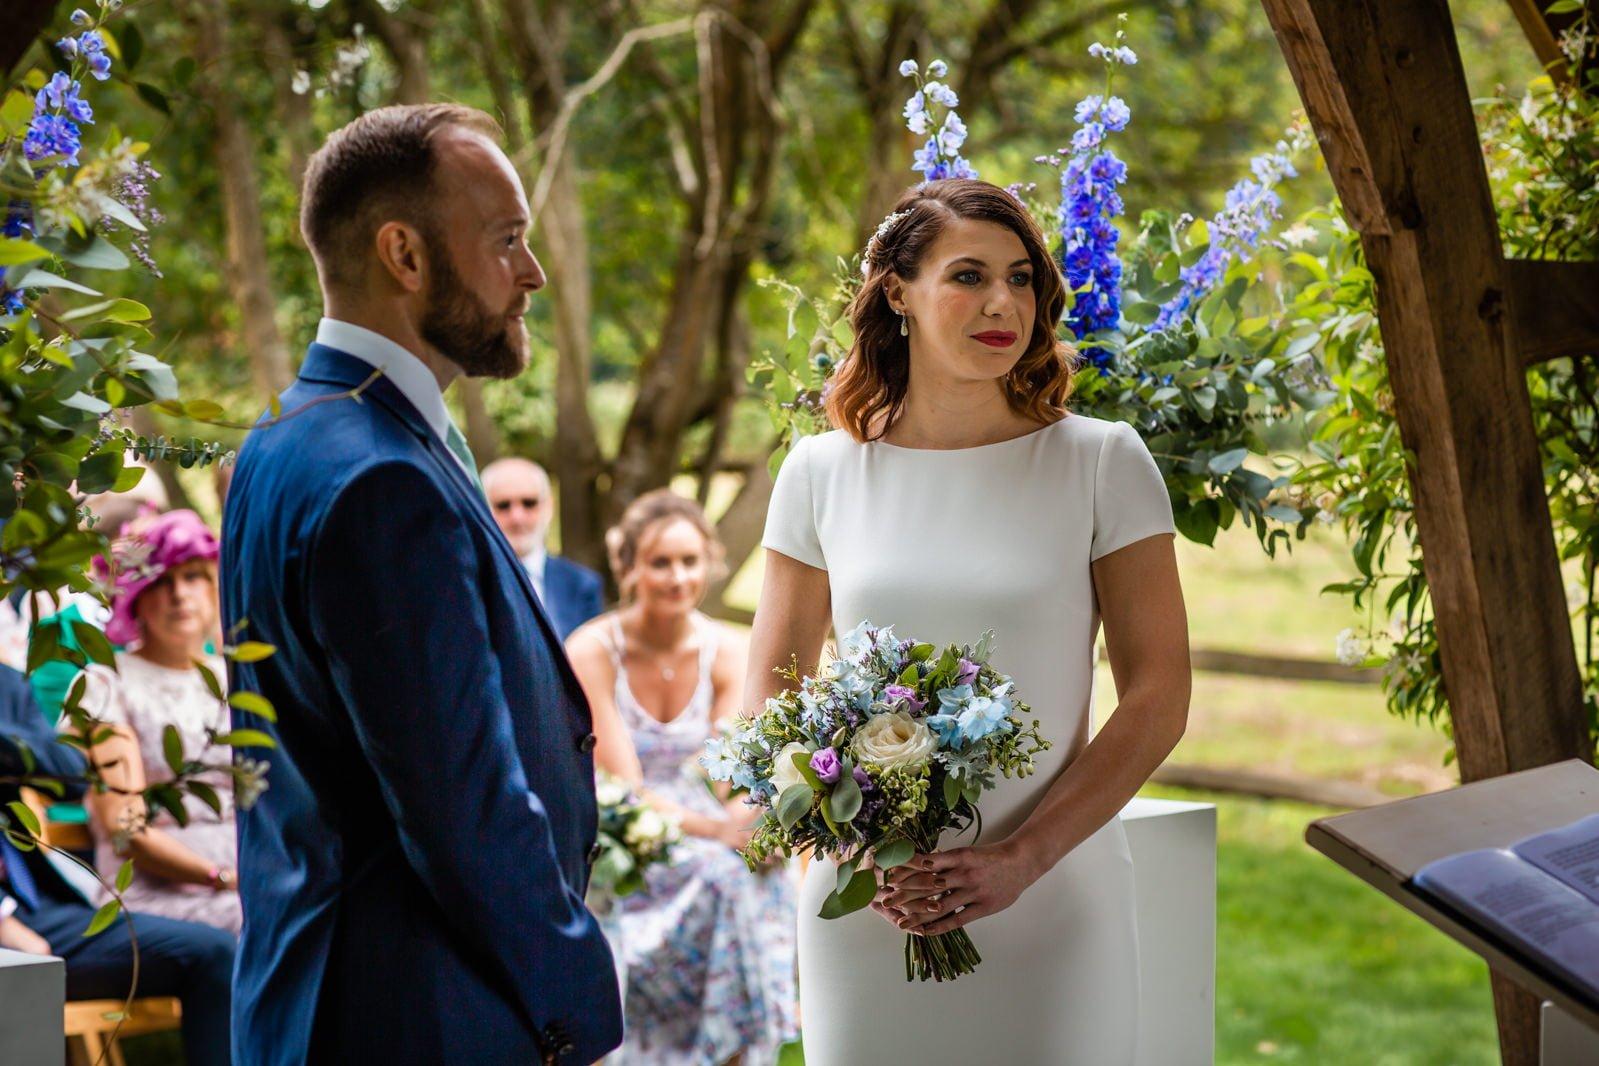 Millbridge Court Wedding - stunning summer wedding - wedding photography 50